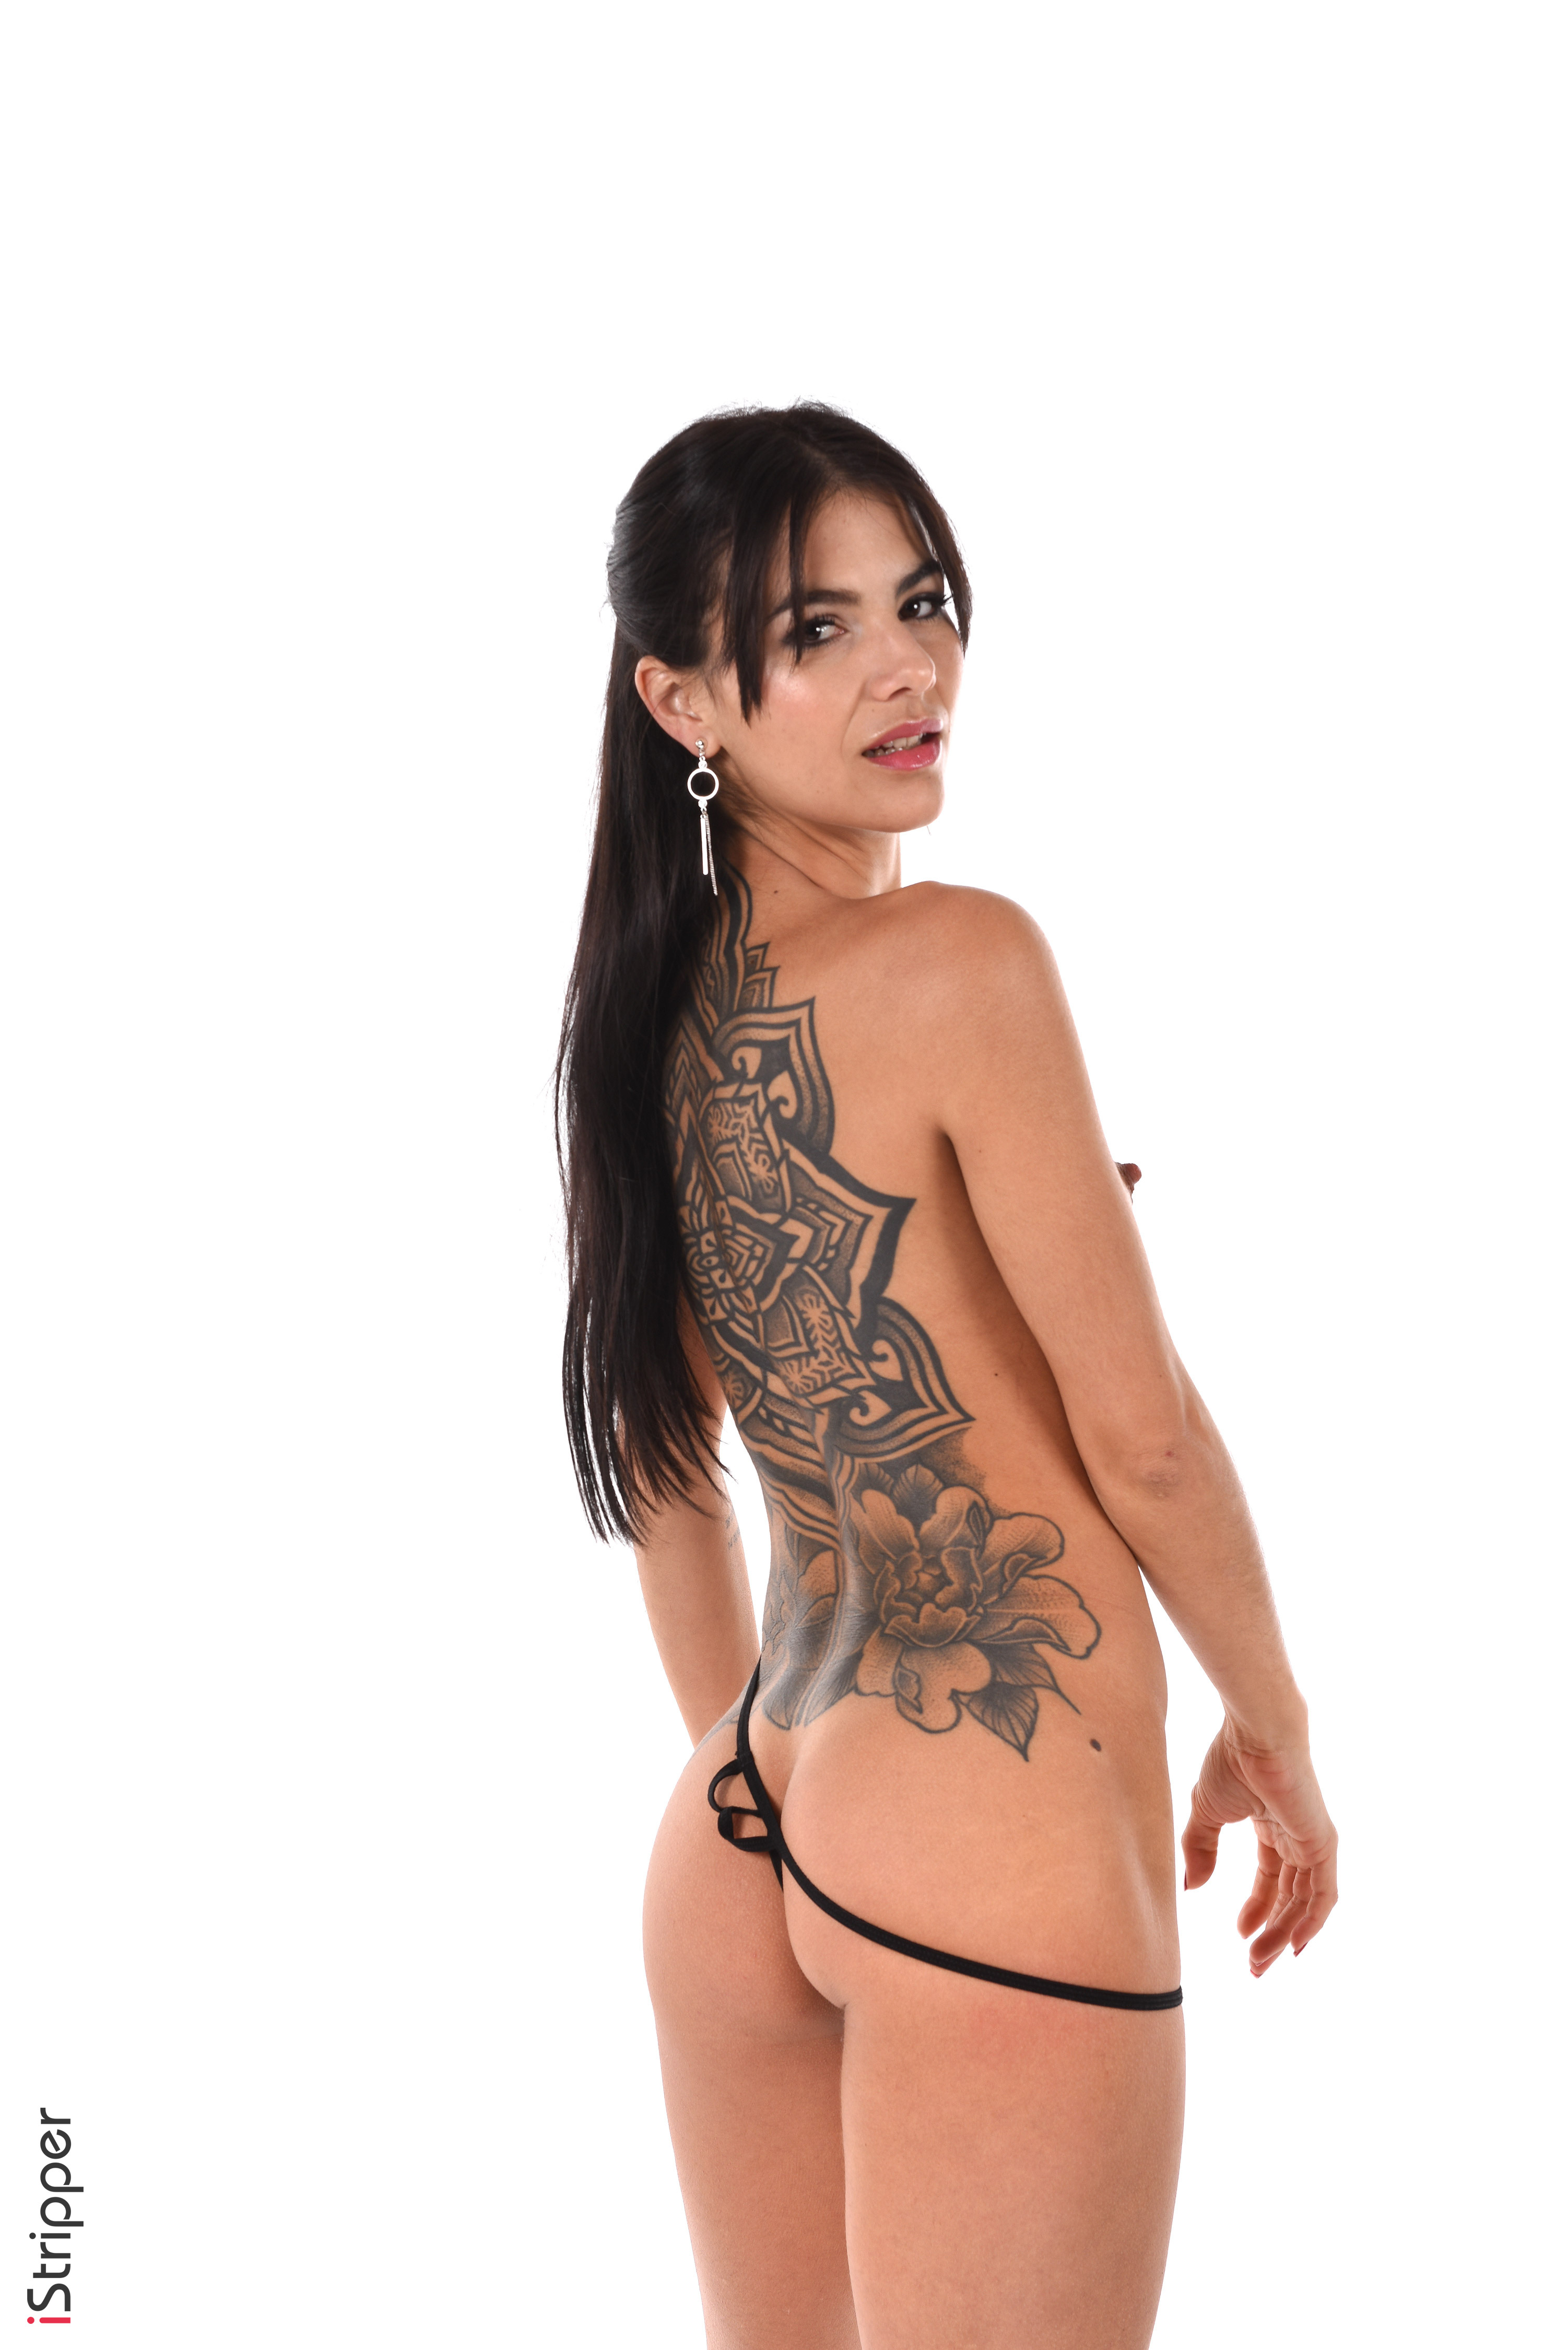 nude wall.com